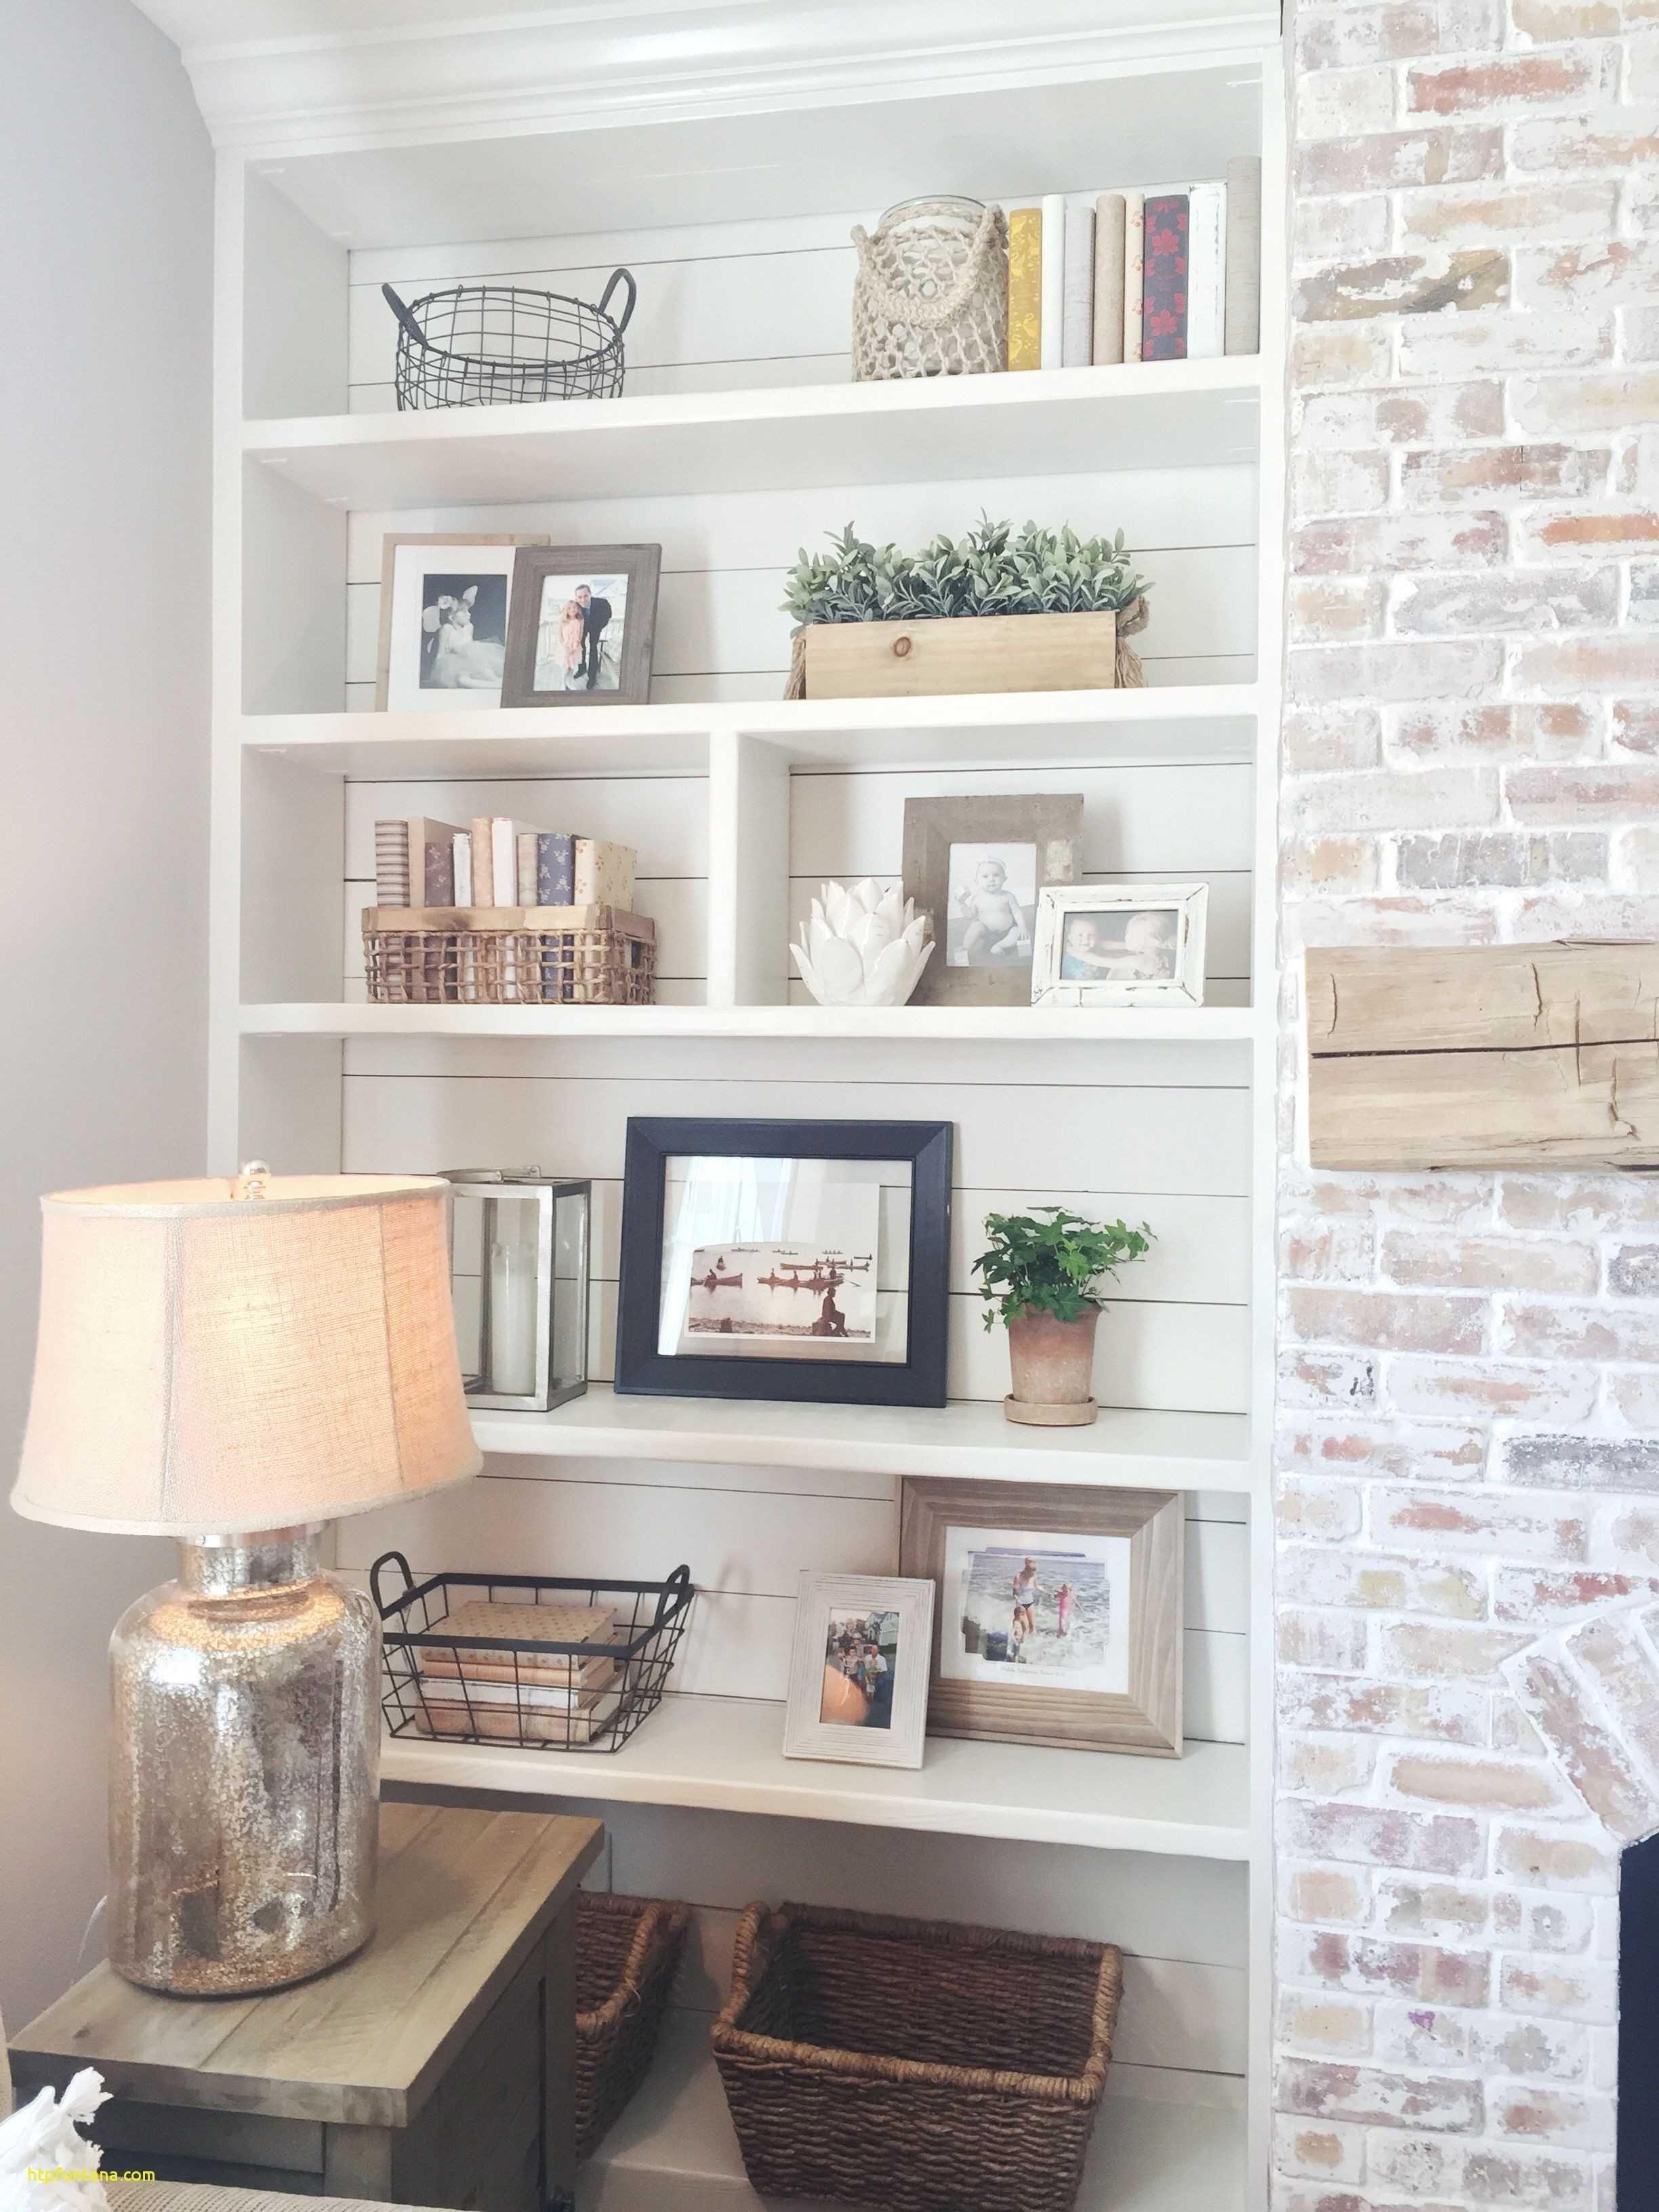 29 Inspirational Modern Living Room Ideas That Will Always In Style Living Room Shelves Farm House Living Room Room Decor